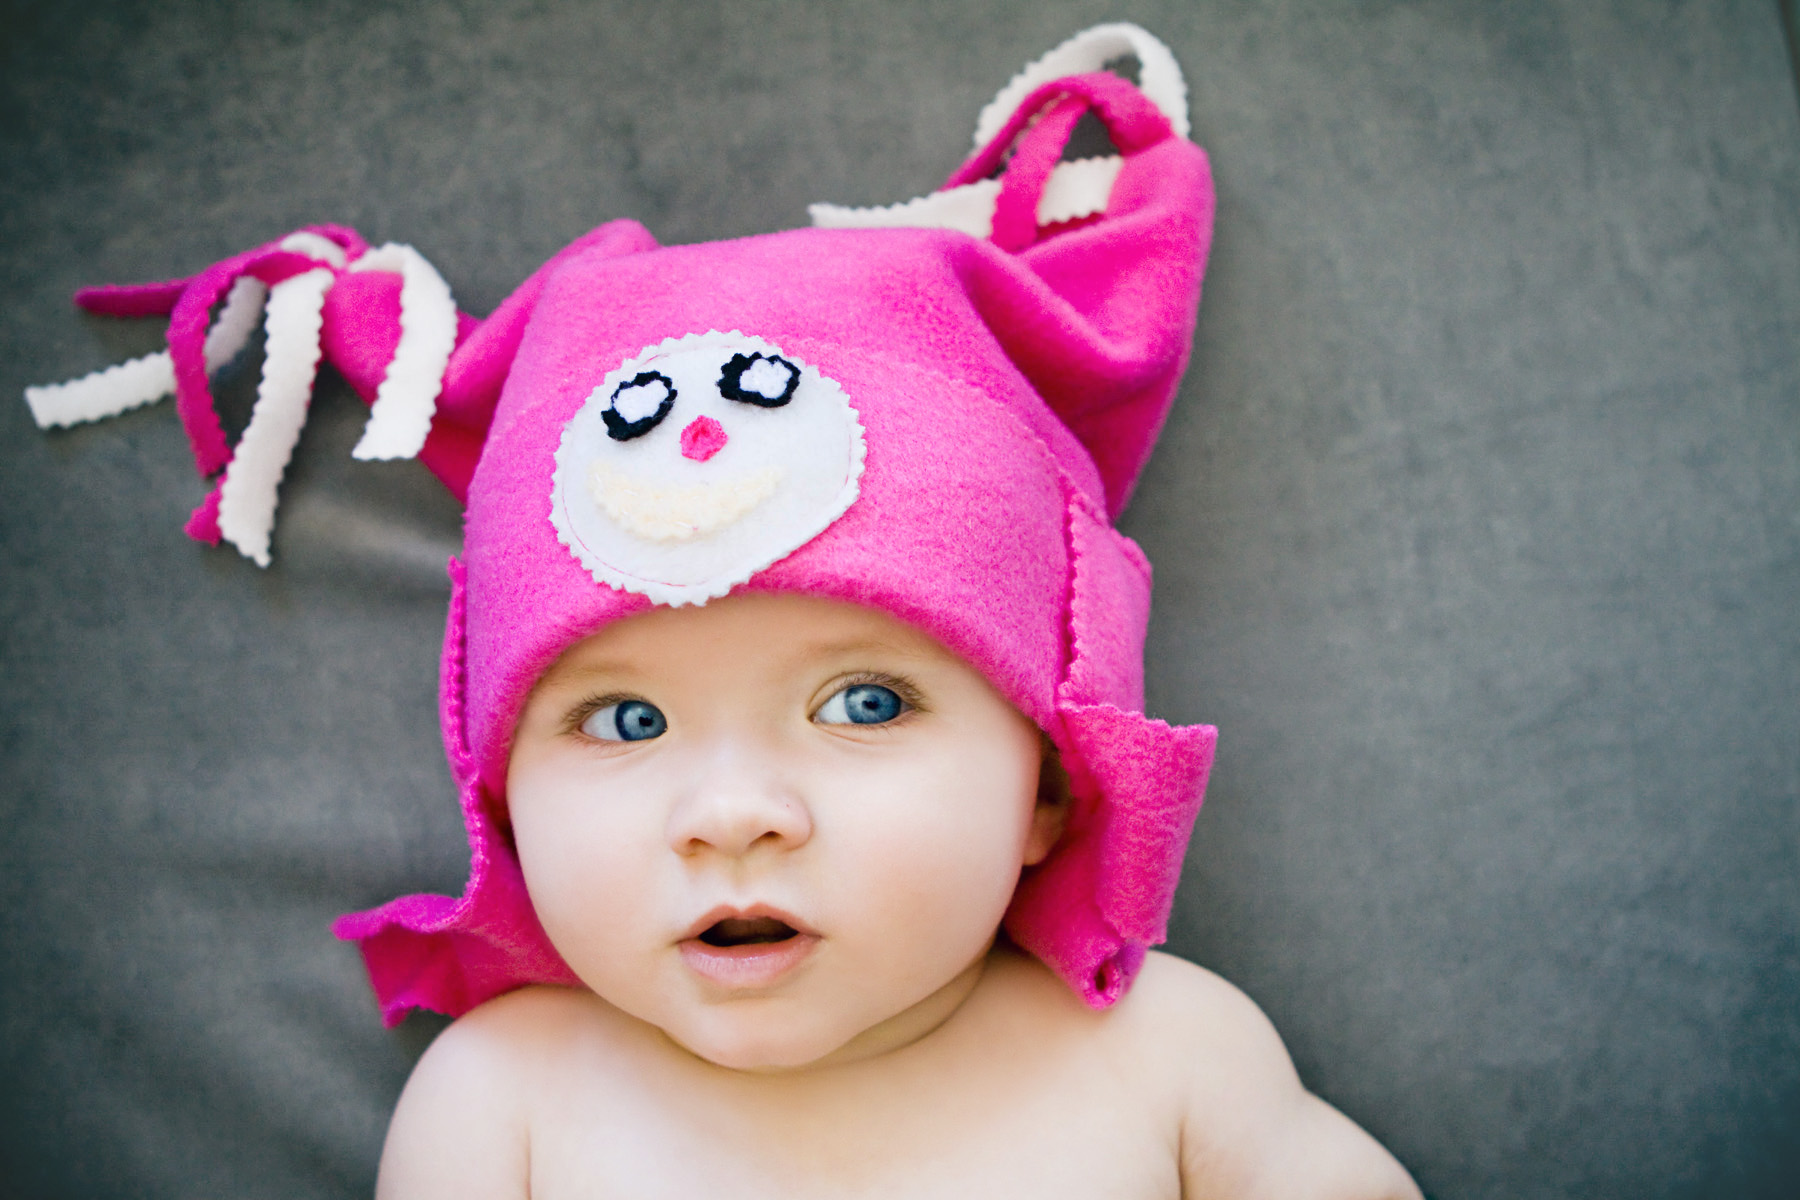 38_baby_website_images_baby_0047_v2.jpg